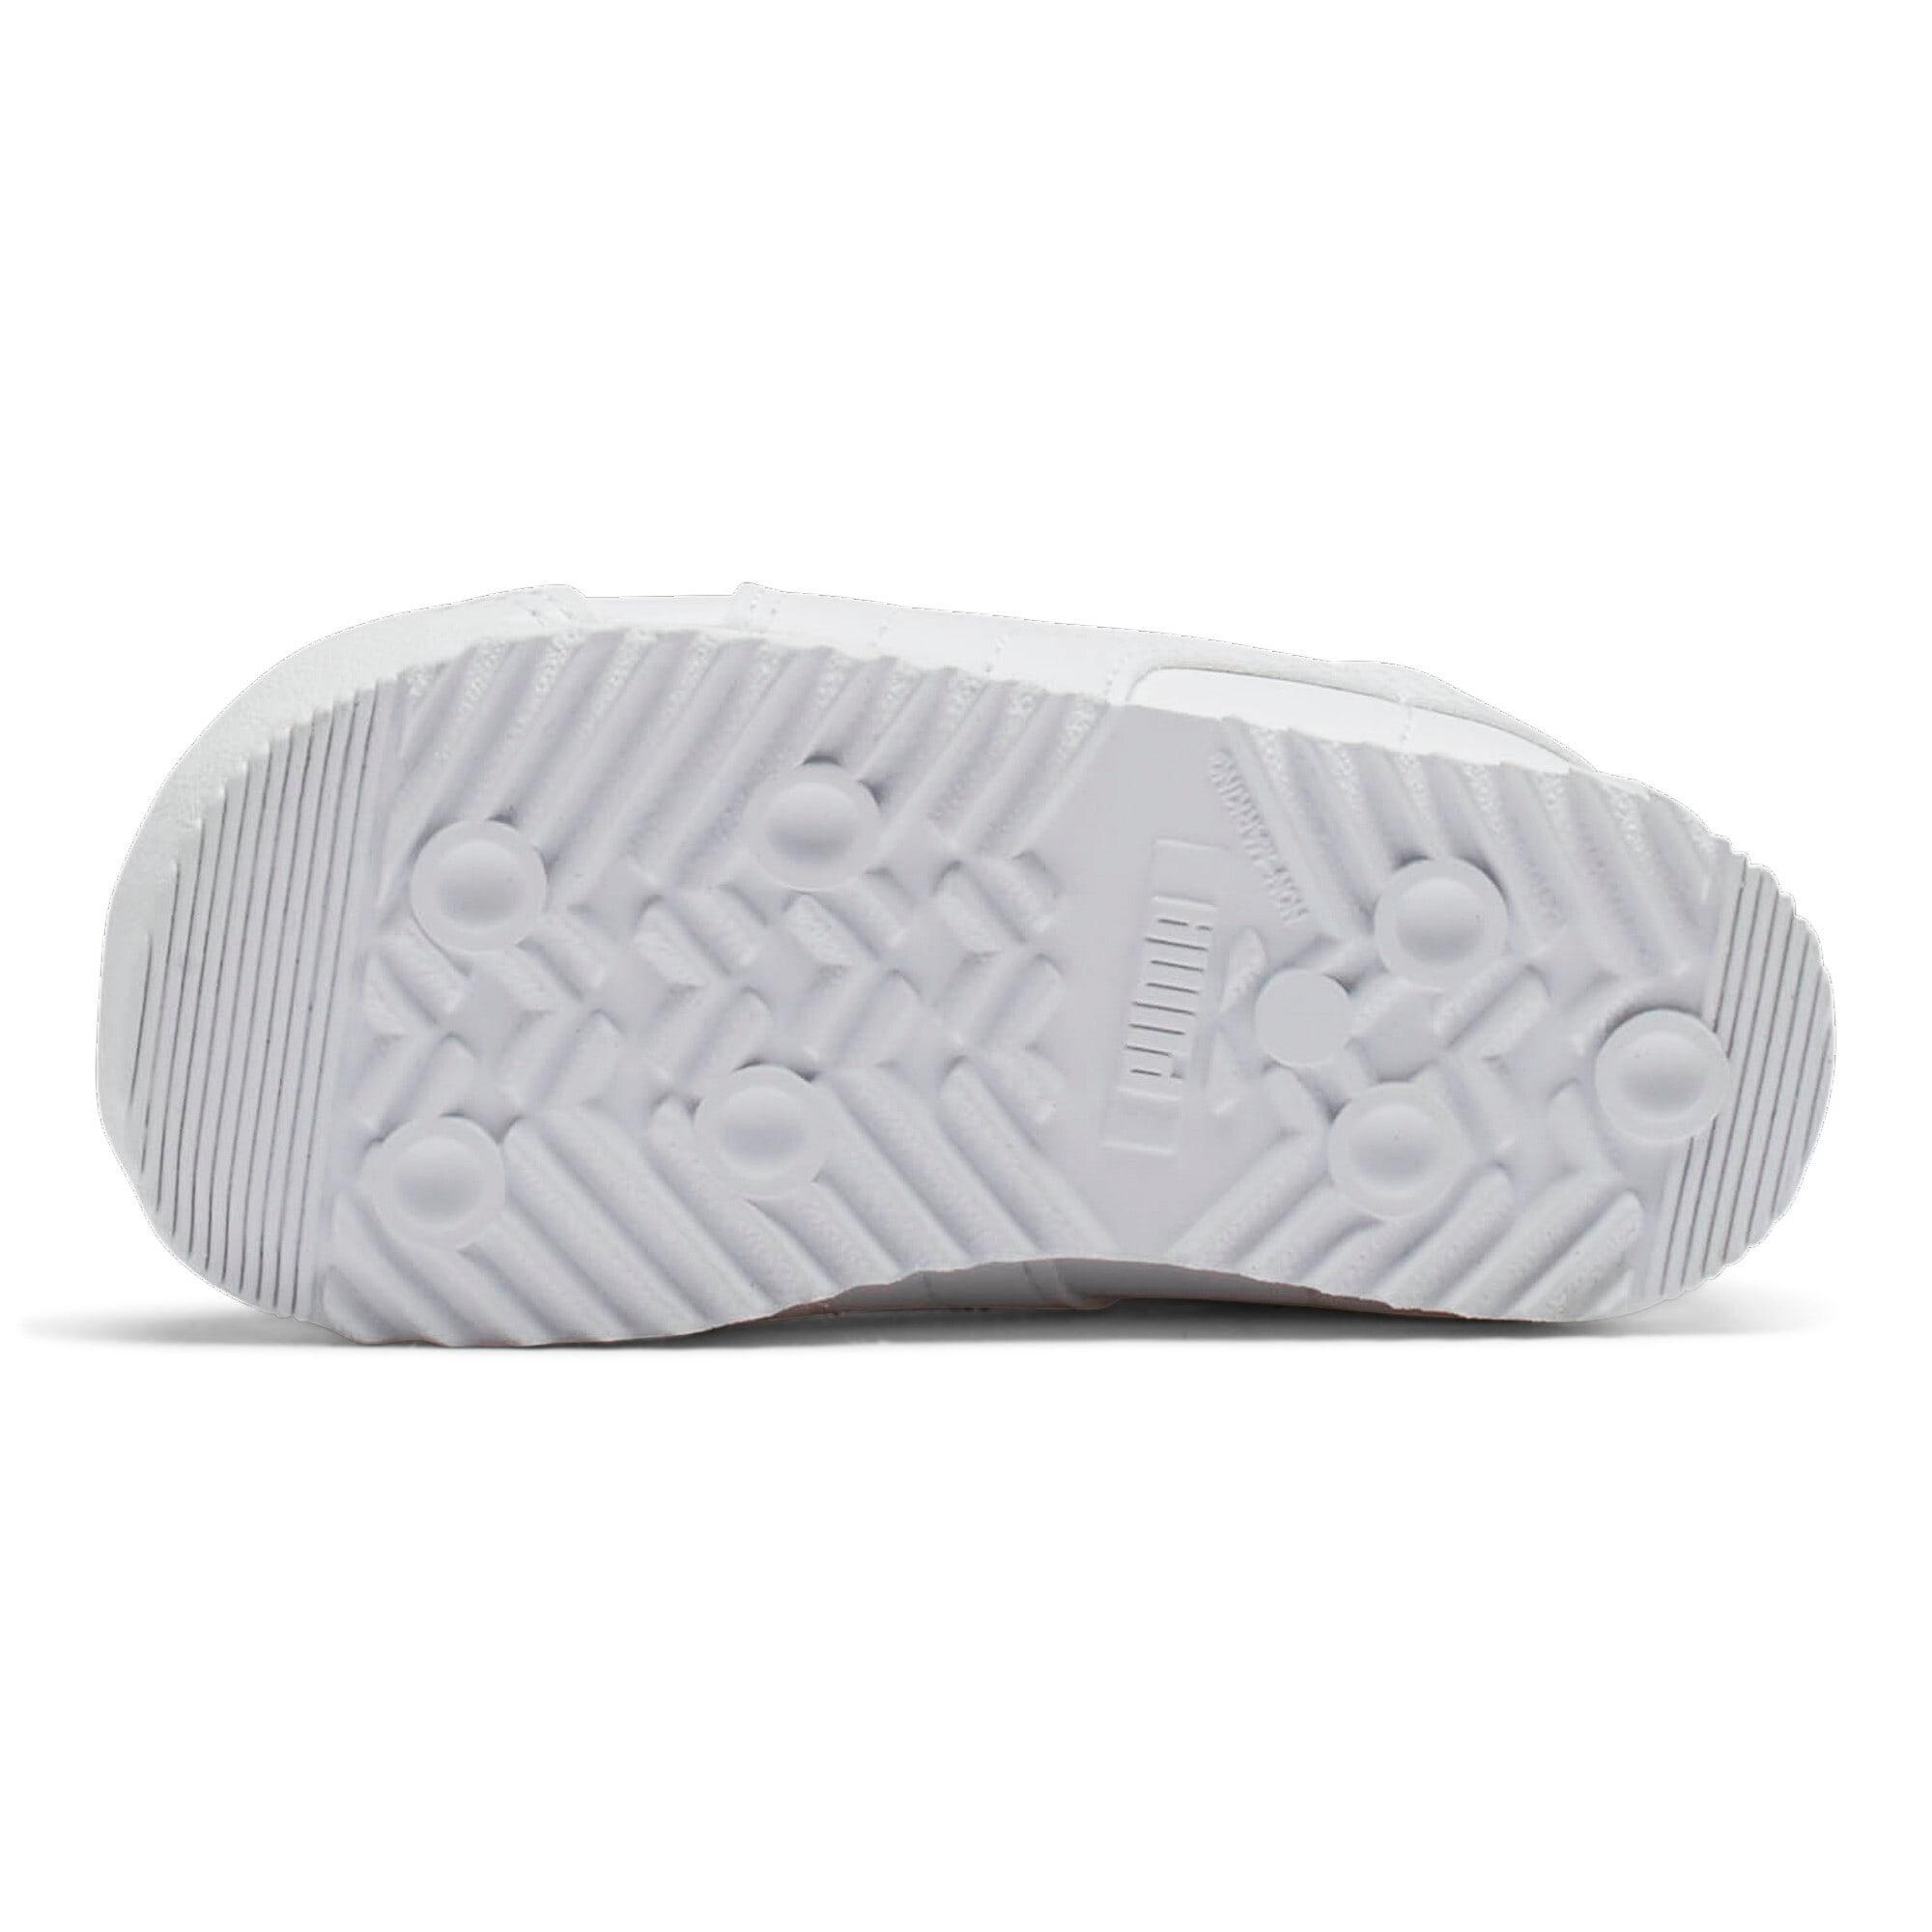 Thumbnail 4 of Roma Basic Toddler Shoes, white-light gray, medium